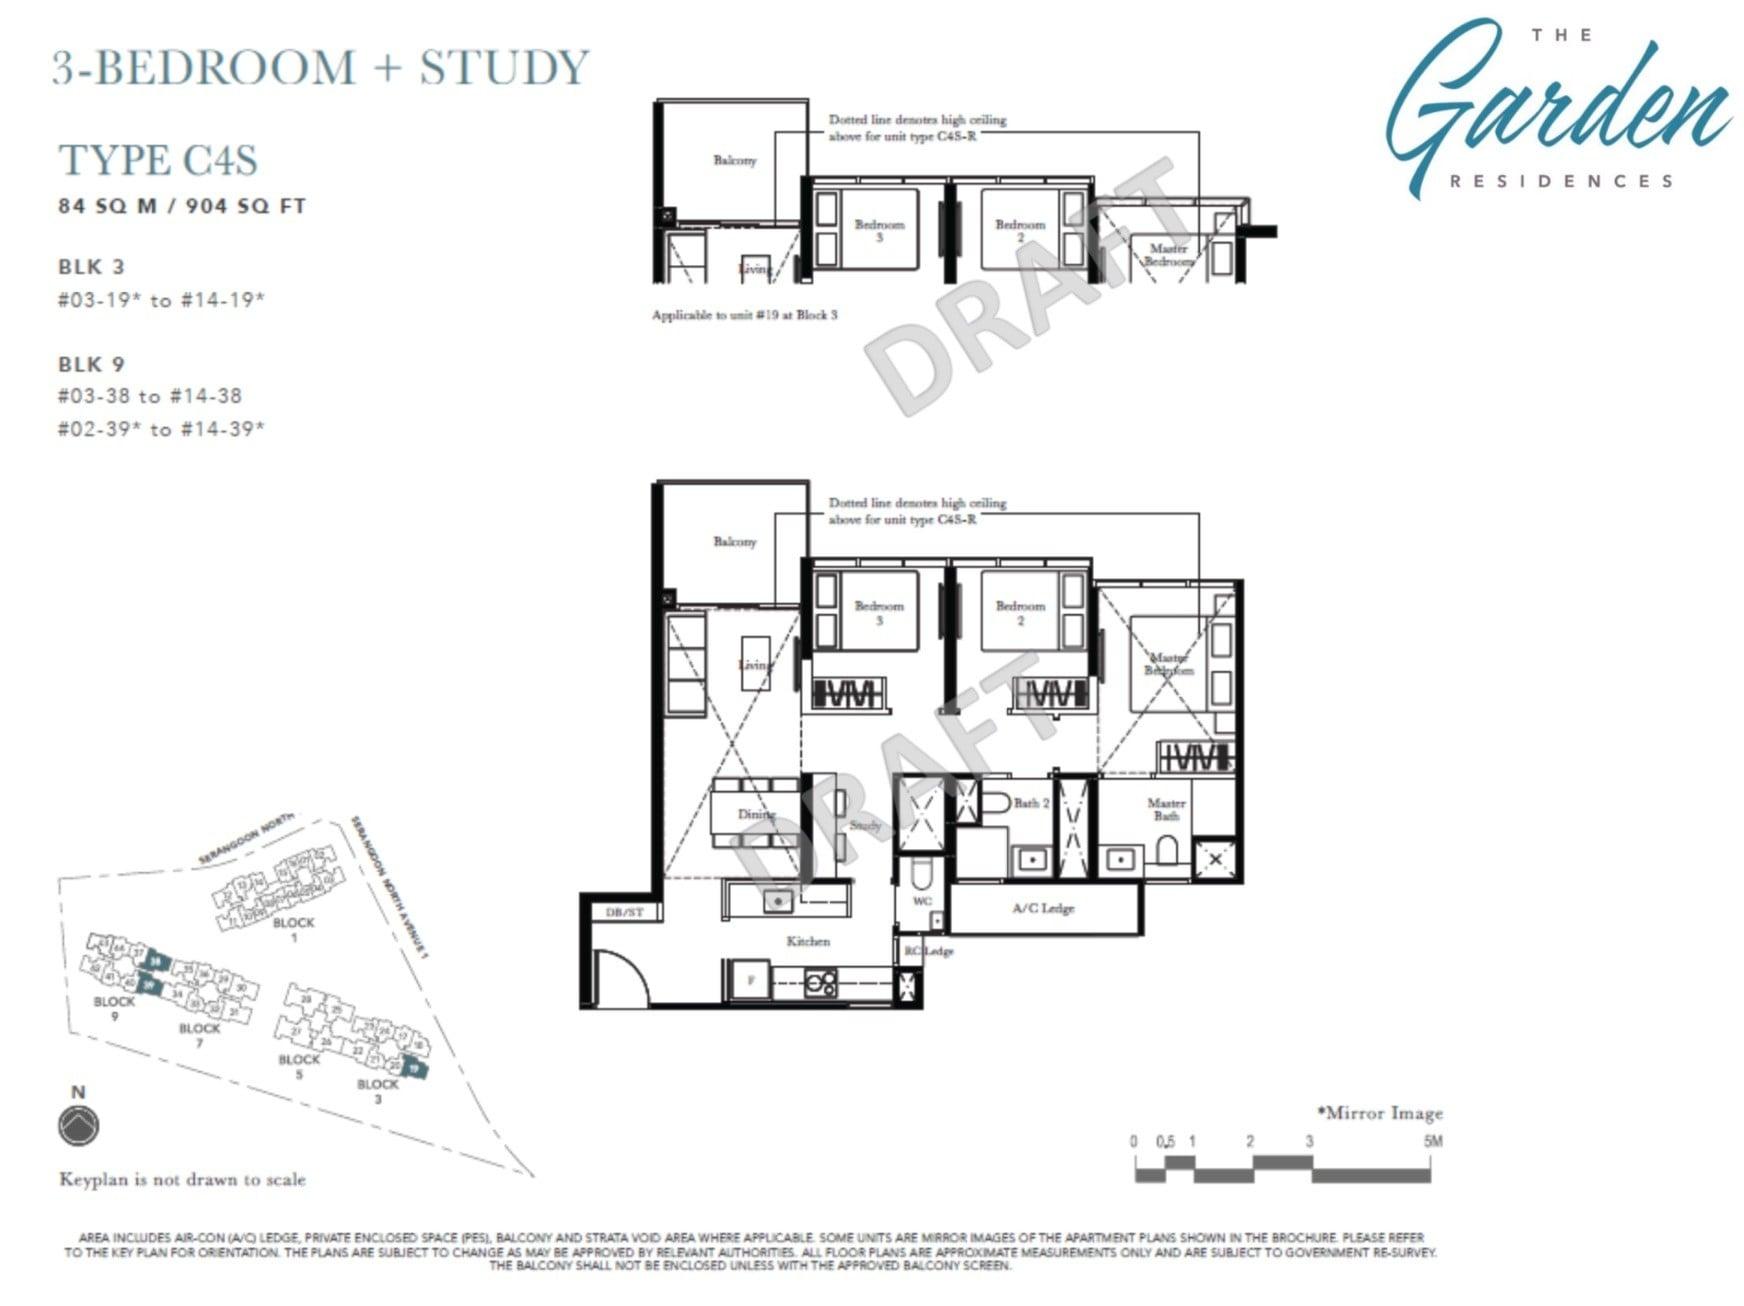 3br-the-garden-residences-floor-plan